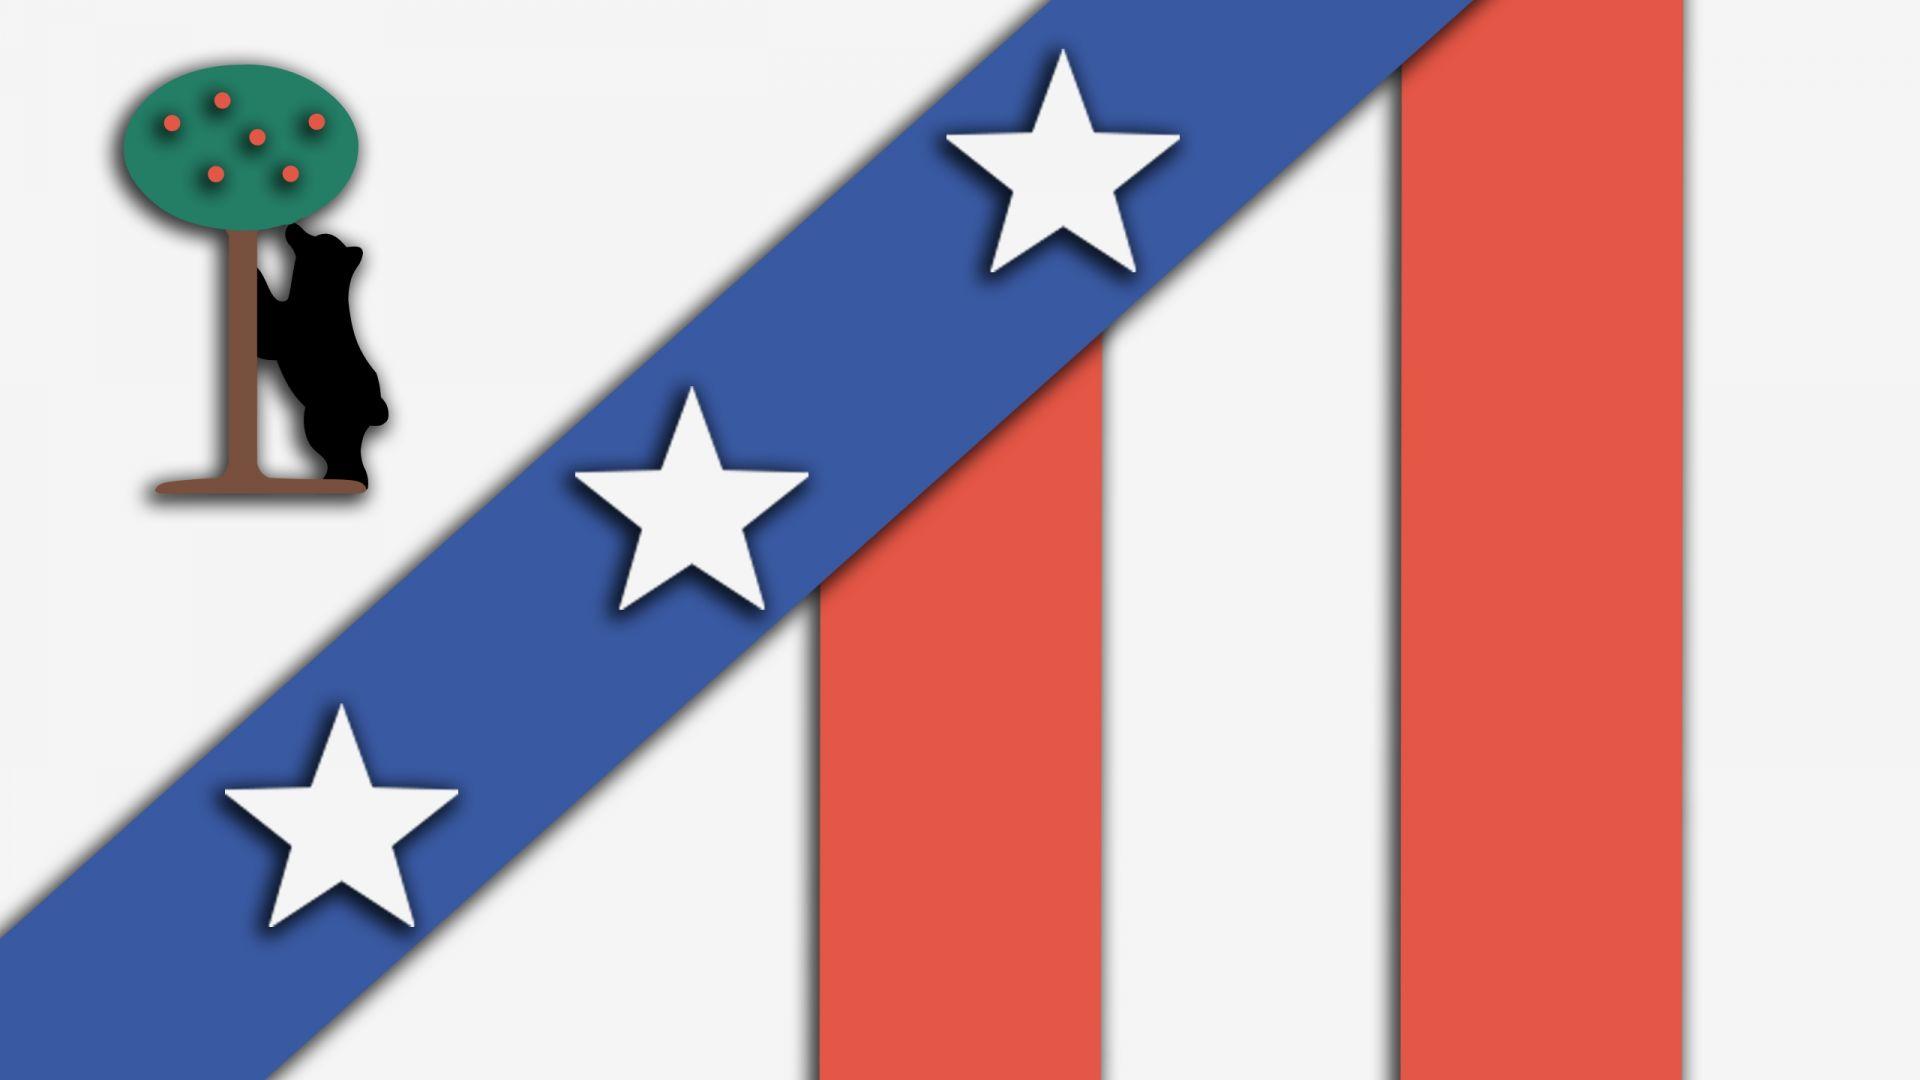 Wallpaper Soccer team, logo, material design